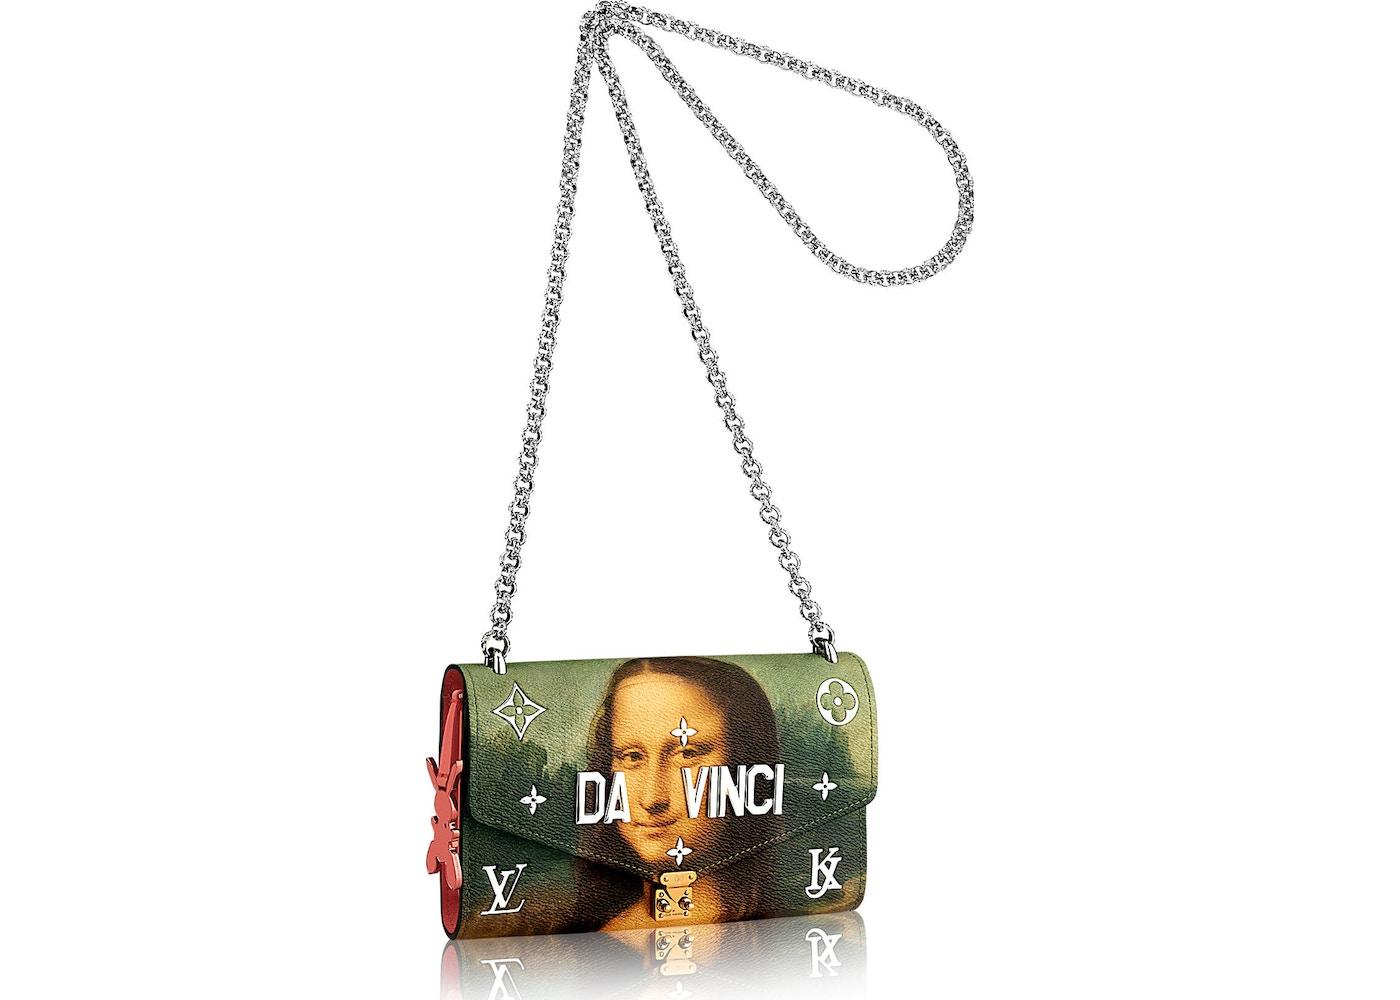 88eec3f864e9 Louis Vuitton Wallet On Chain Leonardo da Vinci Masters Jeff Koons ...